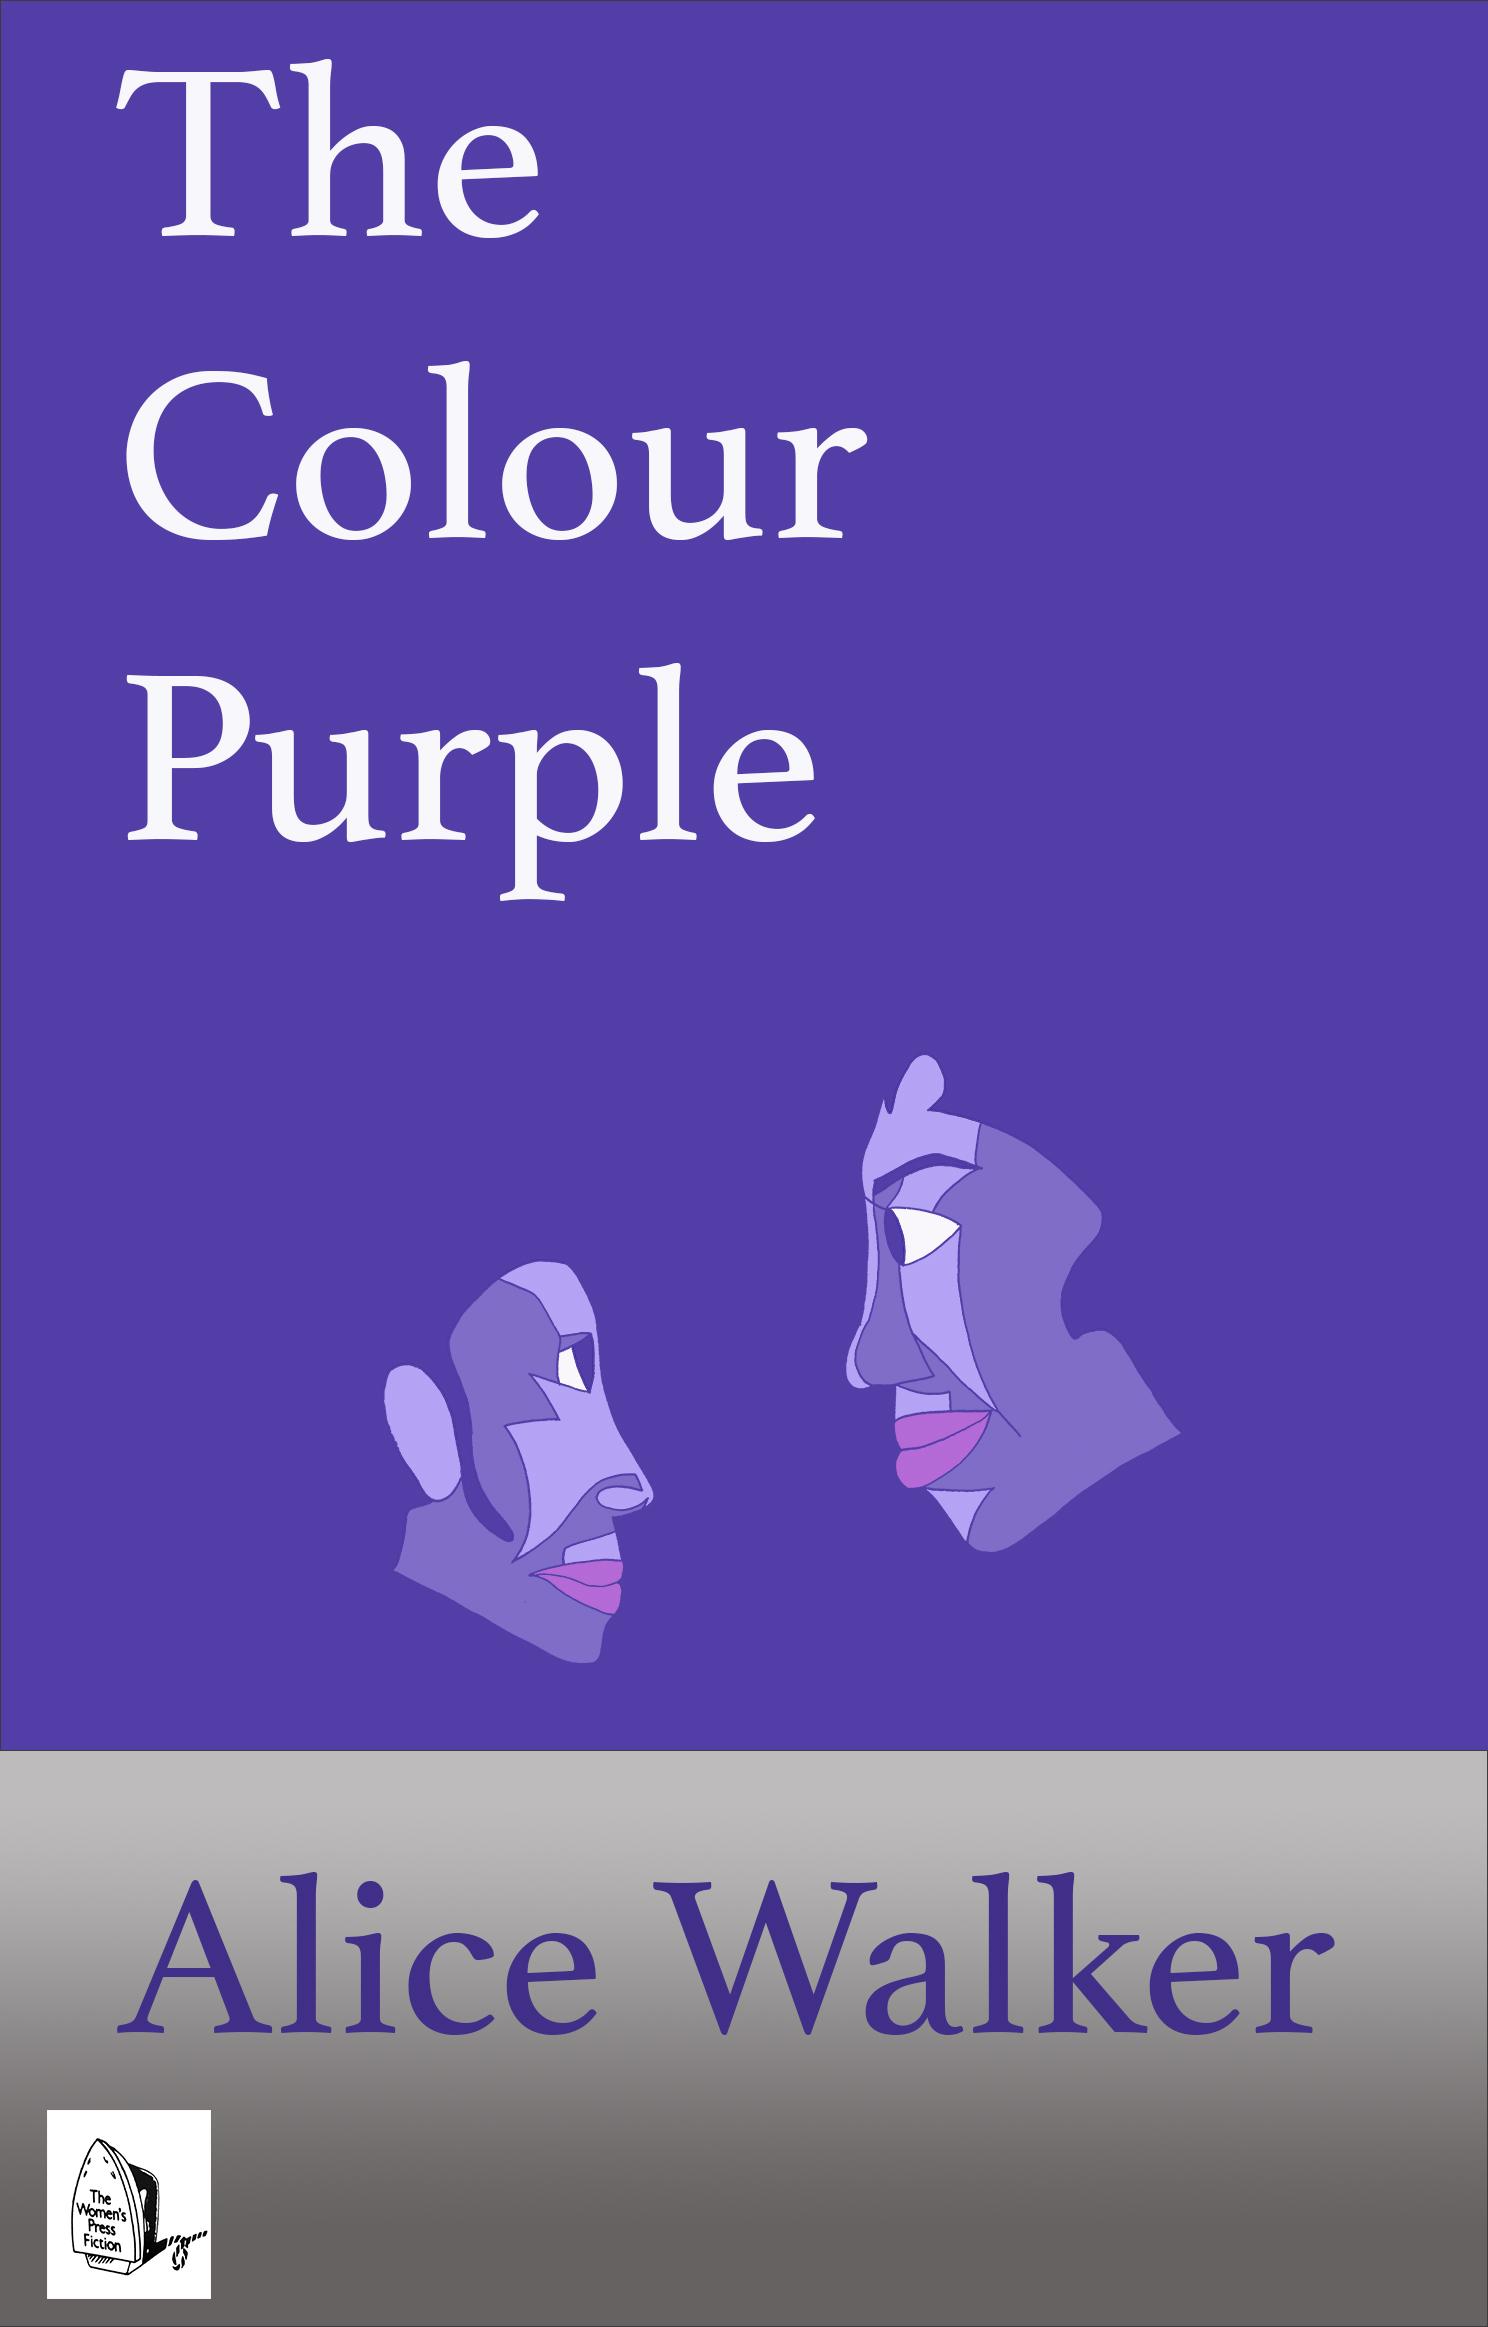 The colour purple cover 8.jpg